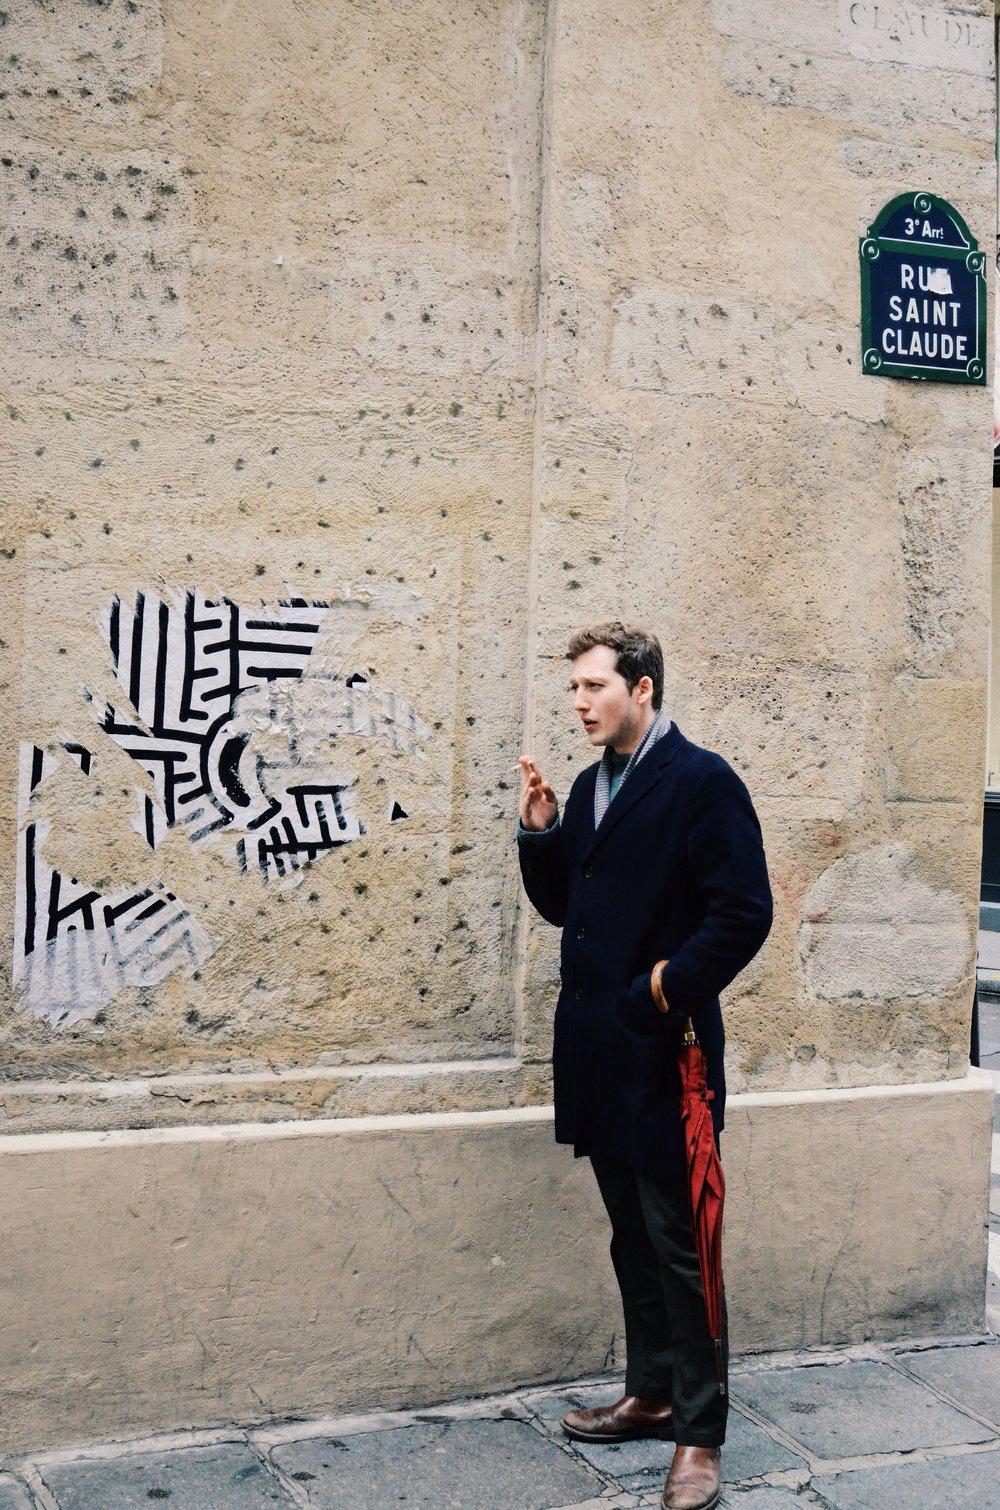 Charles in Paris